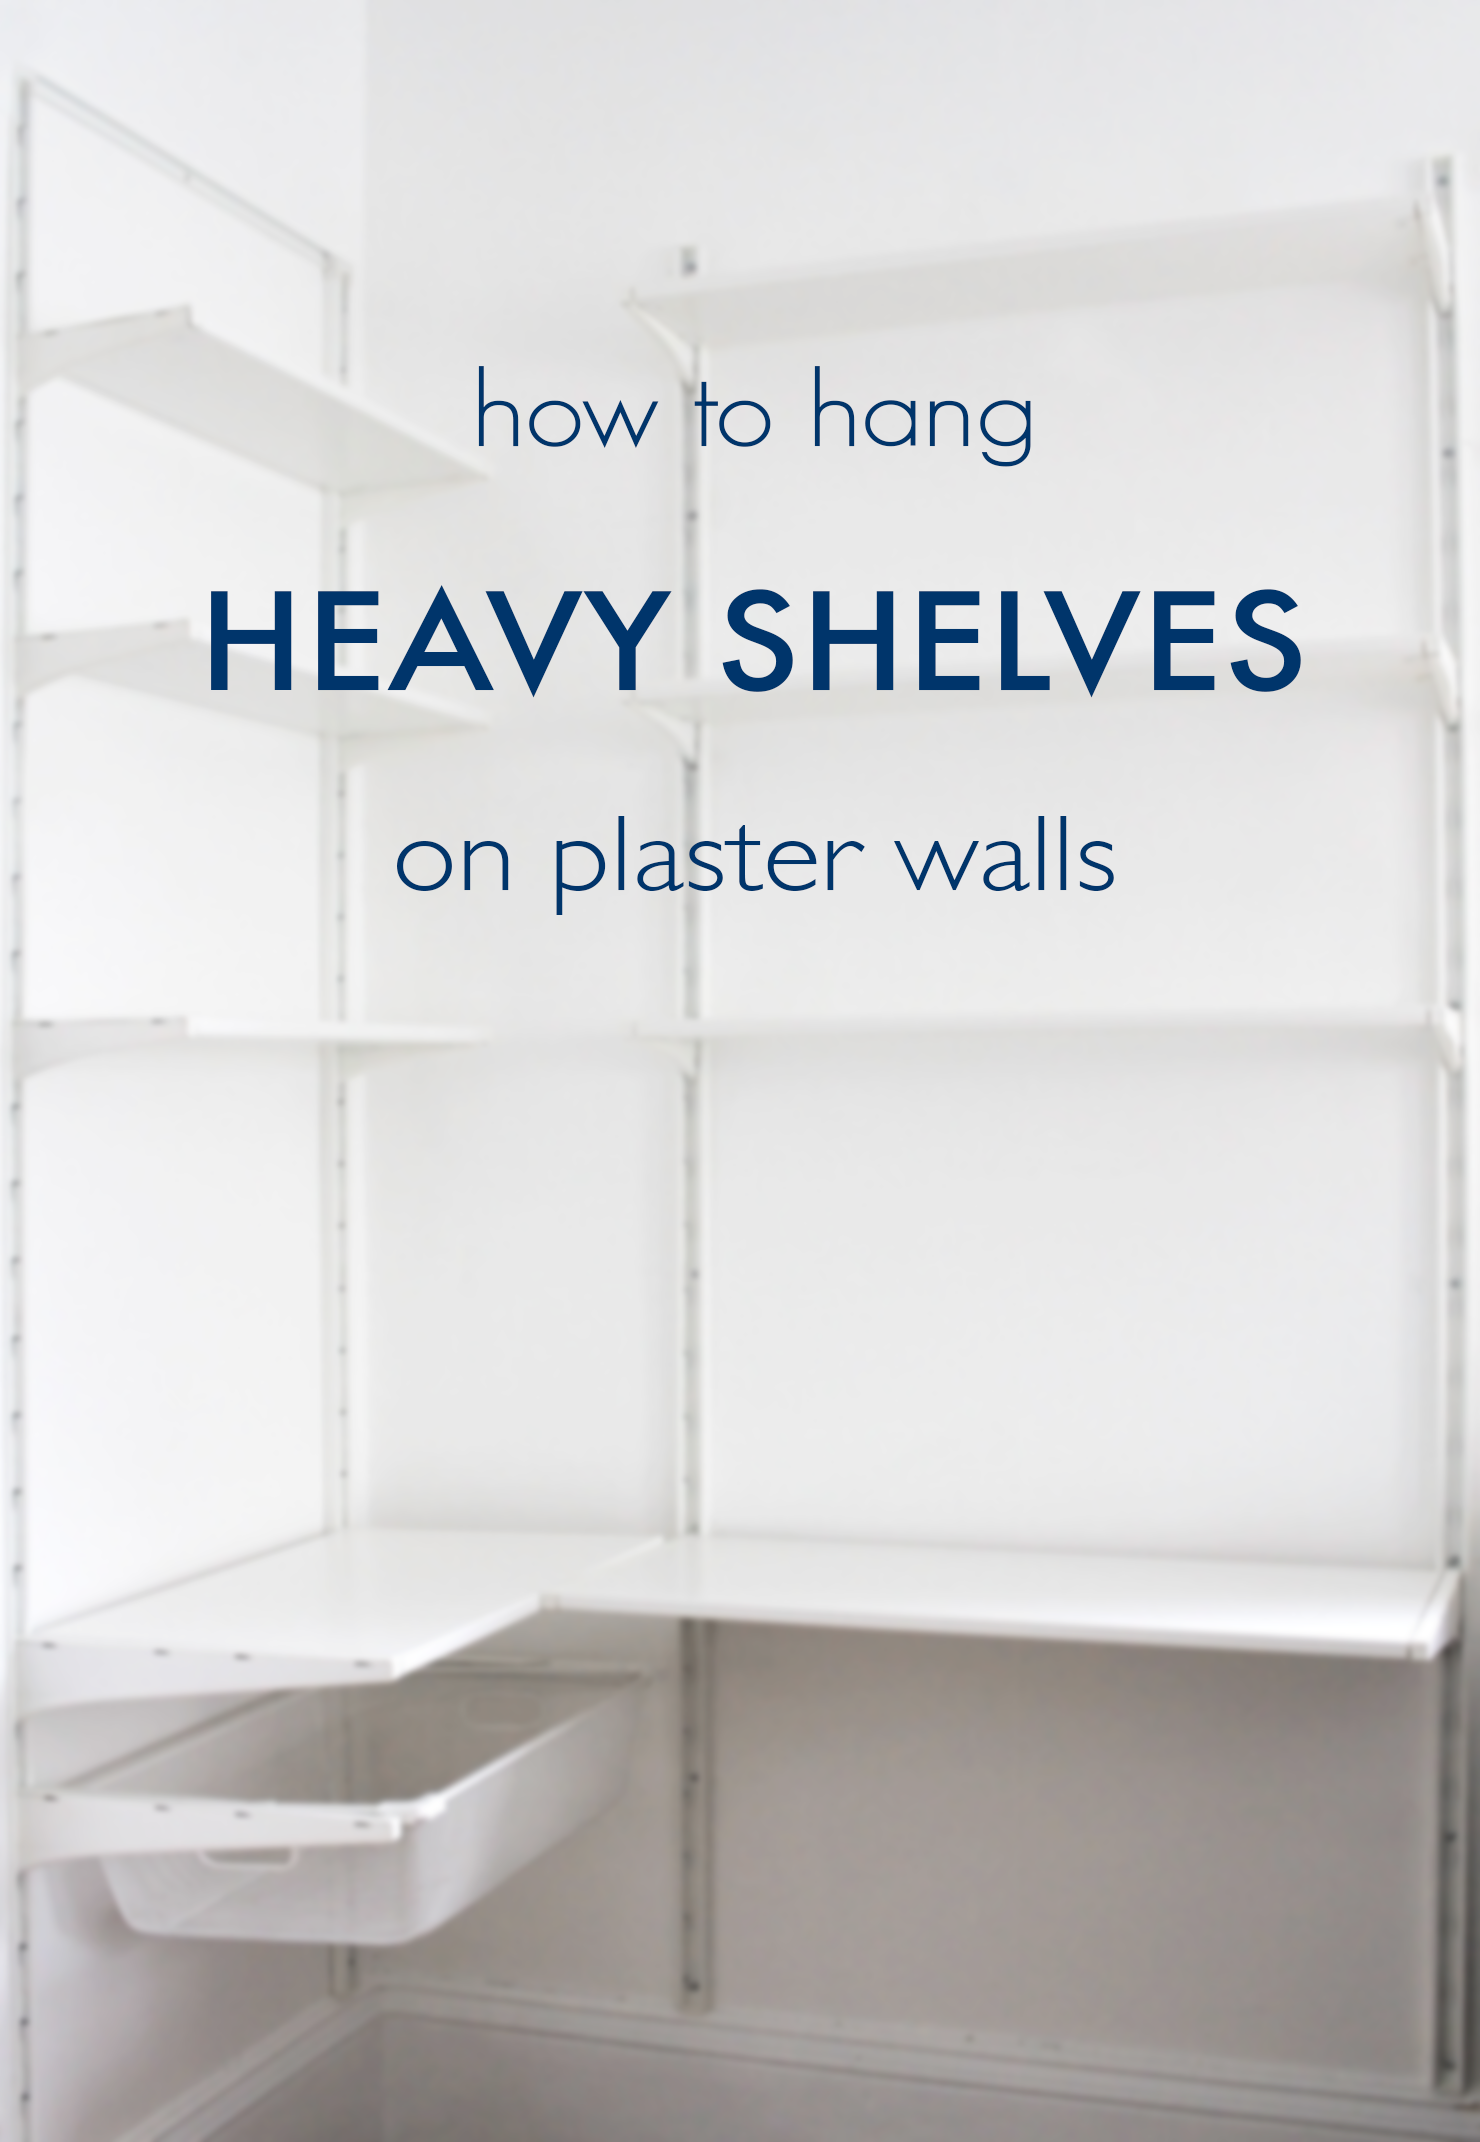 How To Hang Heavy Shelves On Horsehair Plaster Walls Old Homes Plaster Walls Plasterboard Wall Plaster